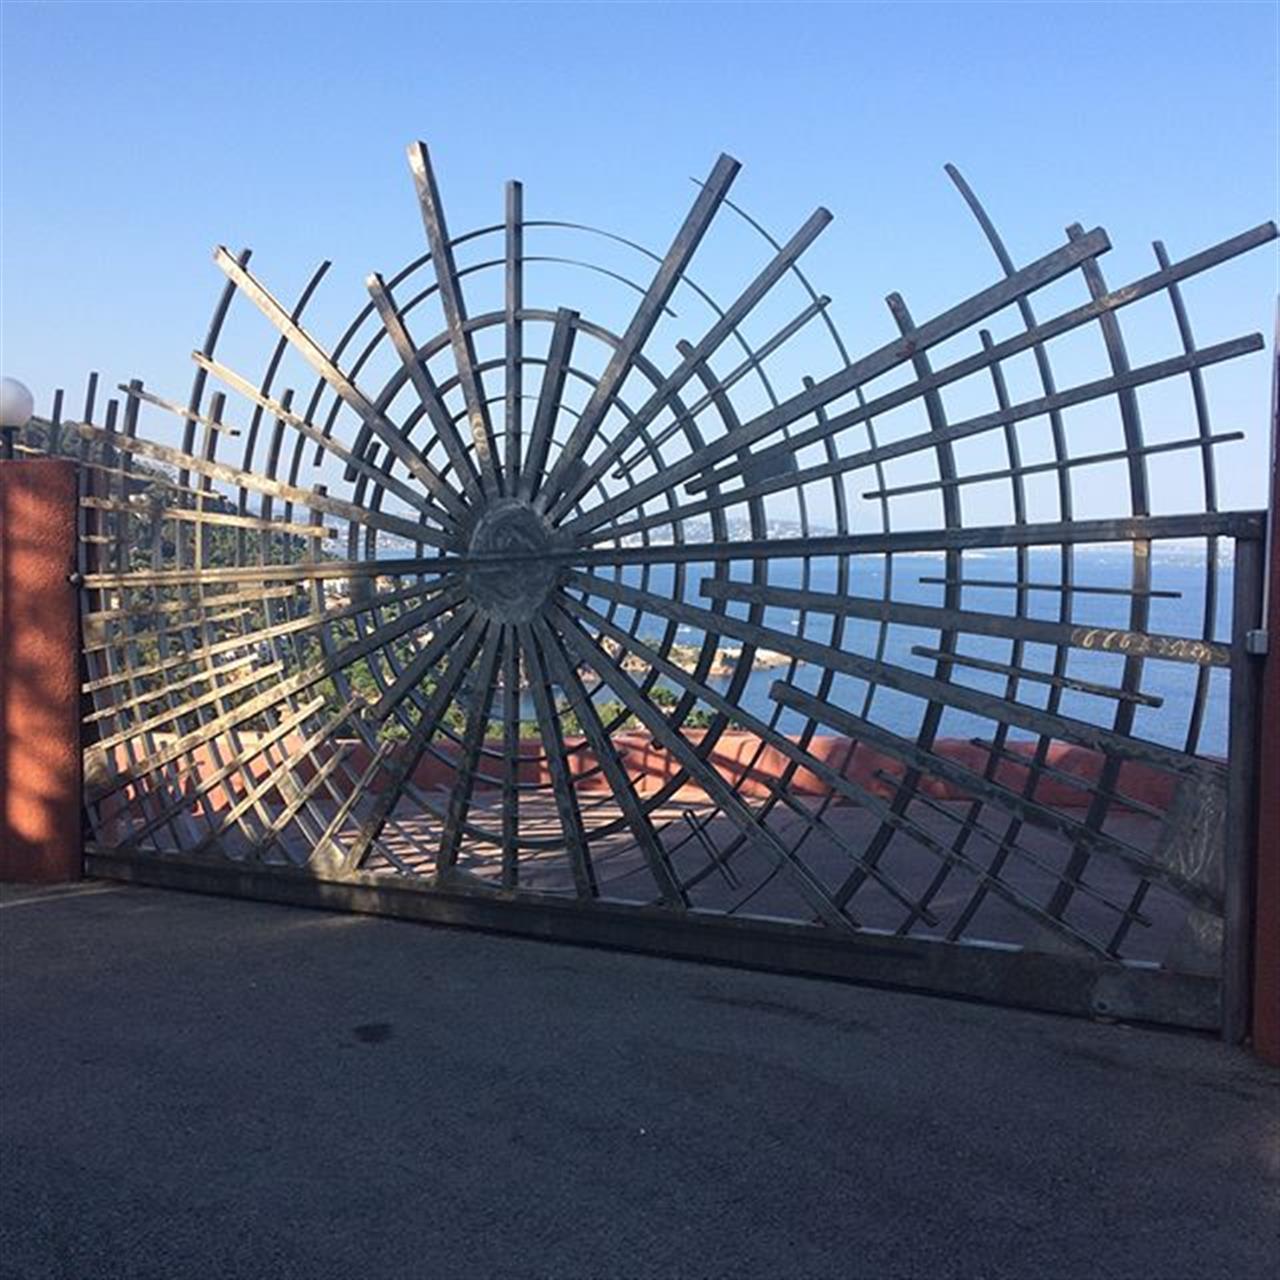 #bubblehouse #anttilovag #theoulesurmer #provence #piercardin #luxuryrealestate #palaisbulles #chemeraviglia #niceview